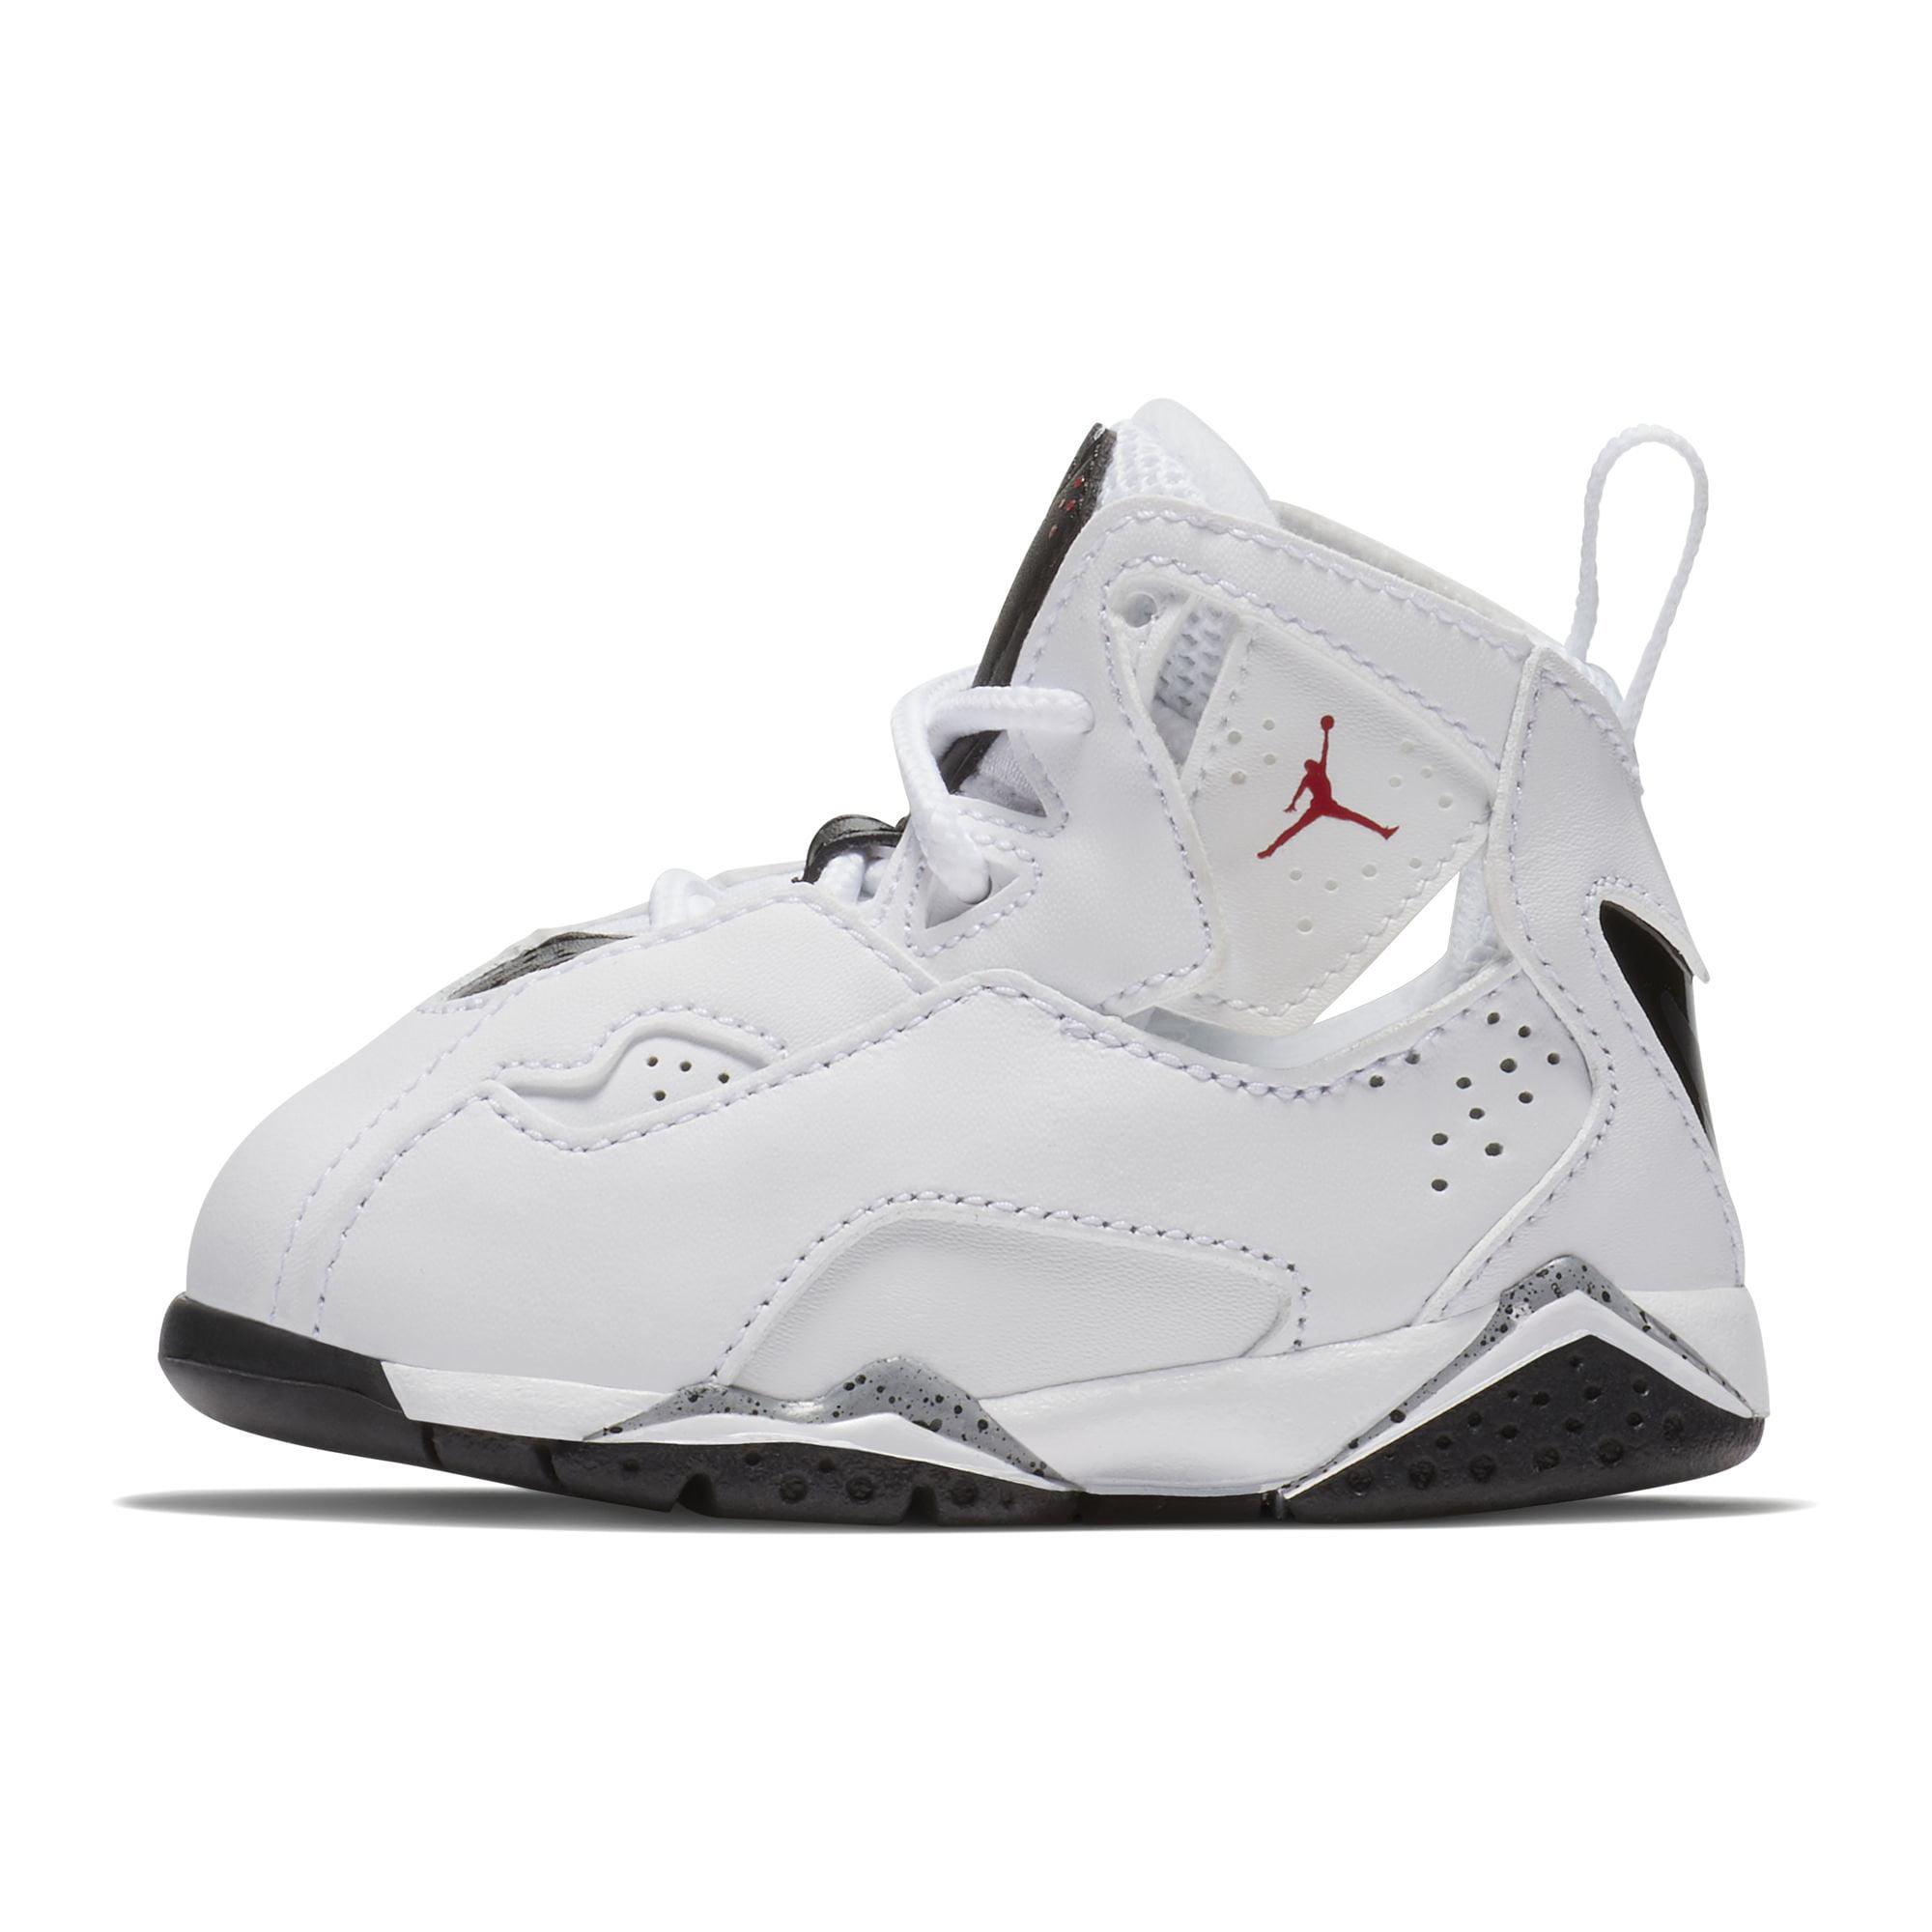 size 40 a3318 c5eb6 ... coupon for product image nike 343797 121 toddler boys jordan true  flight white sneakers e3947 d7d75